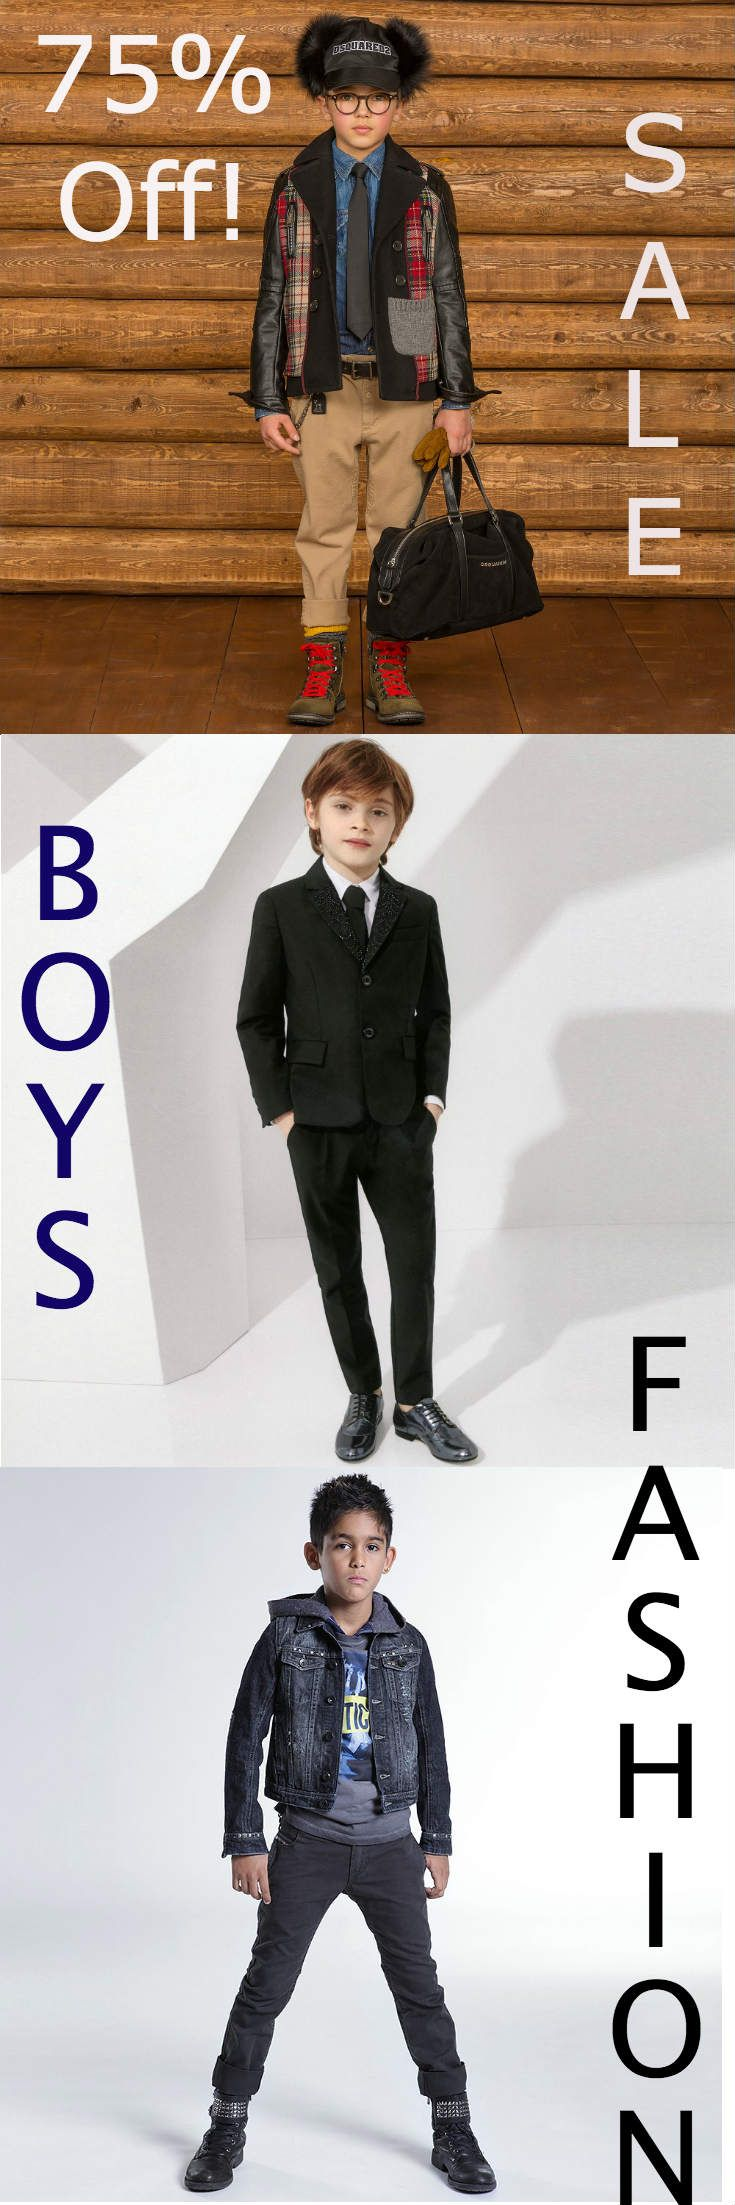 33 Best Images About Best Designer Boys Clothes On